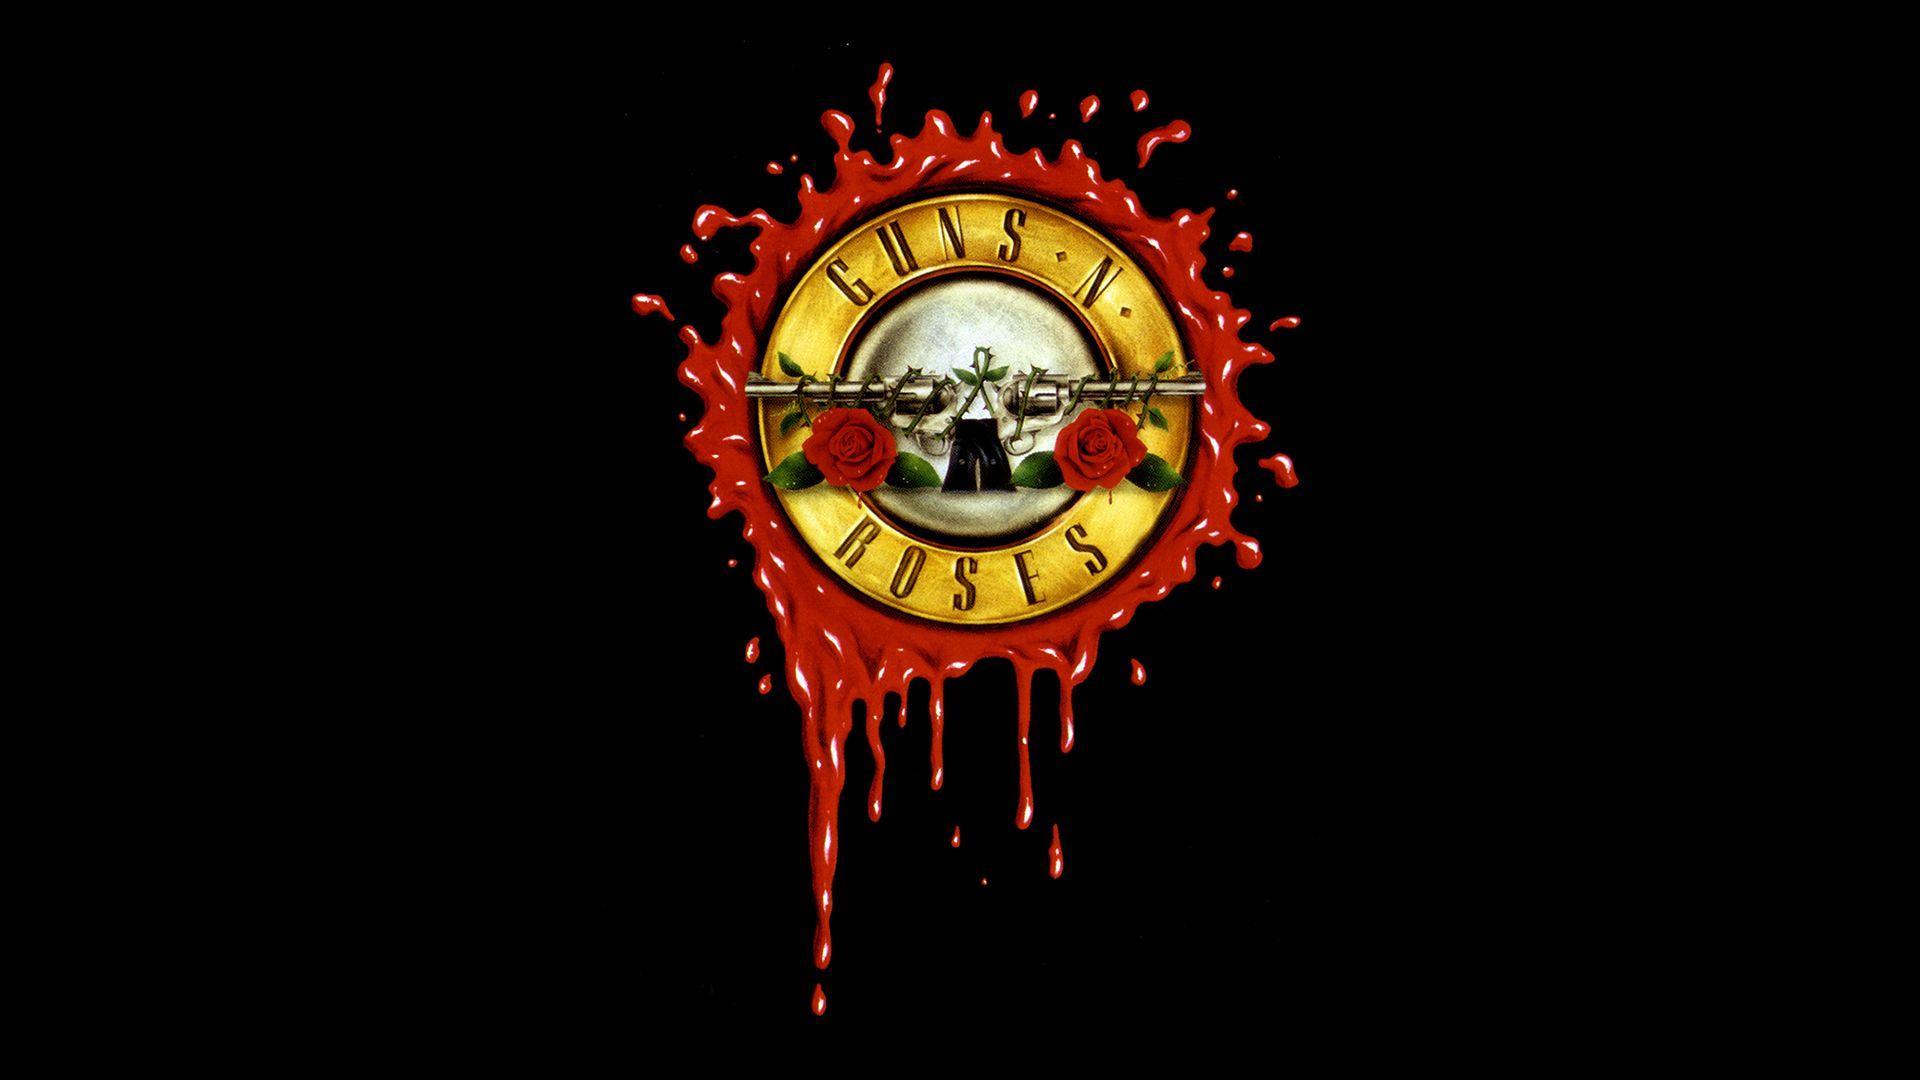 Guns N Roses Logo Wallpaper Hd Guns N Roses Logo Guns N